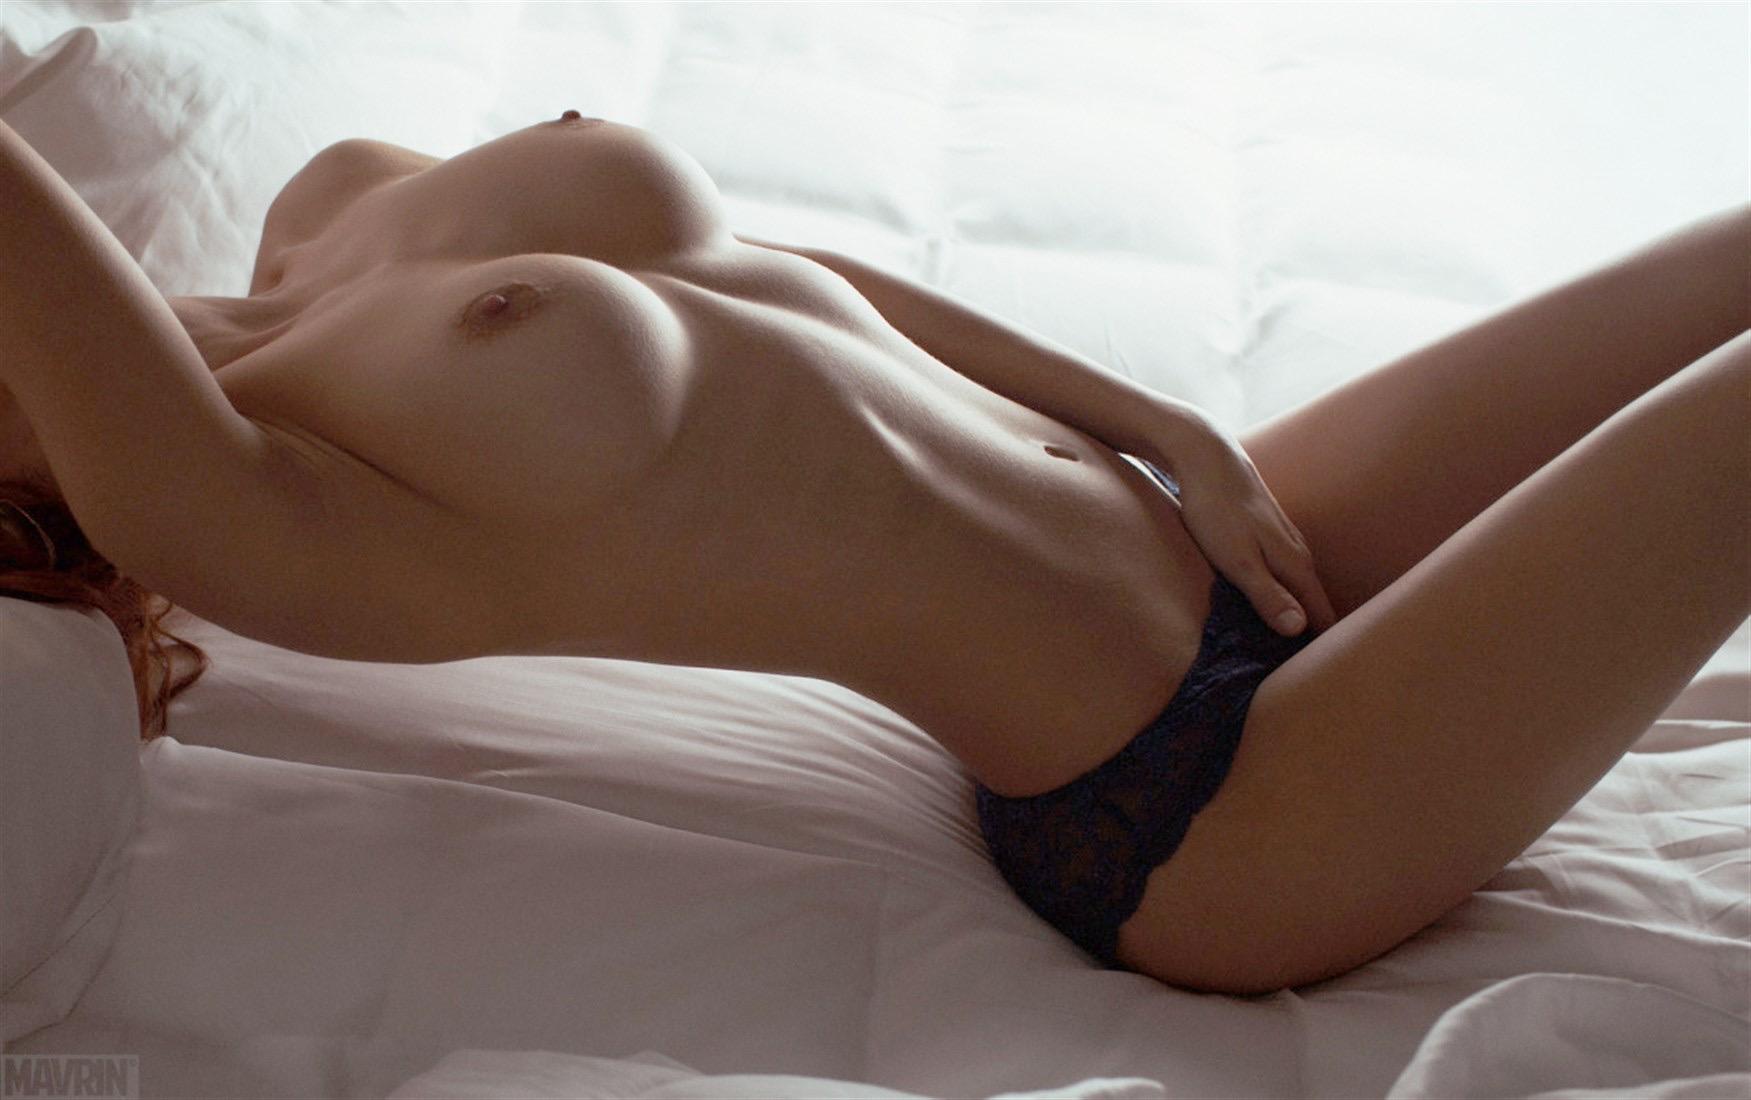 Fully naked ginger girl masturbating public nudity pics, public sex pics